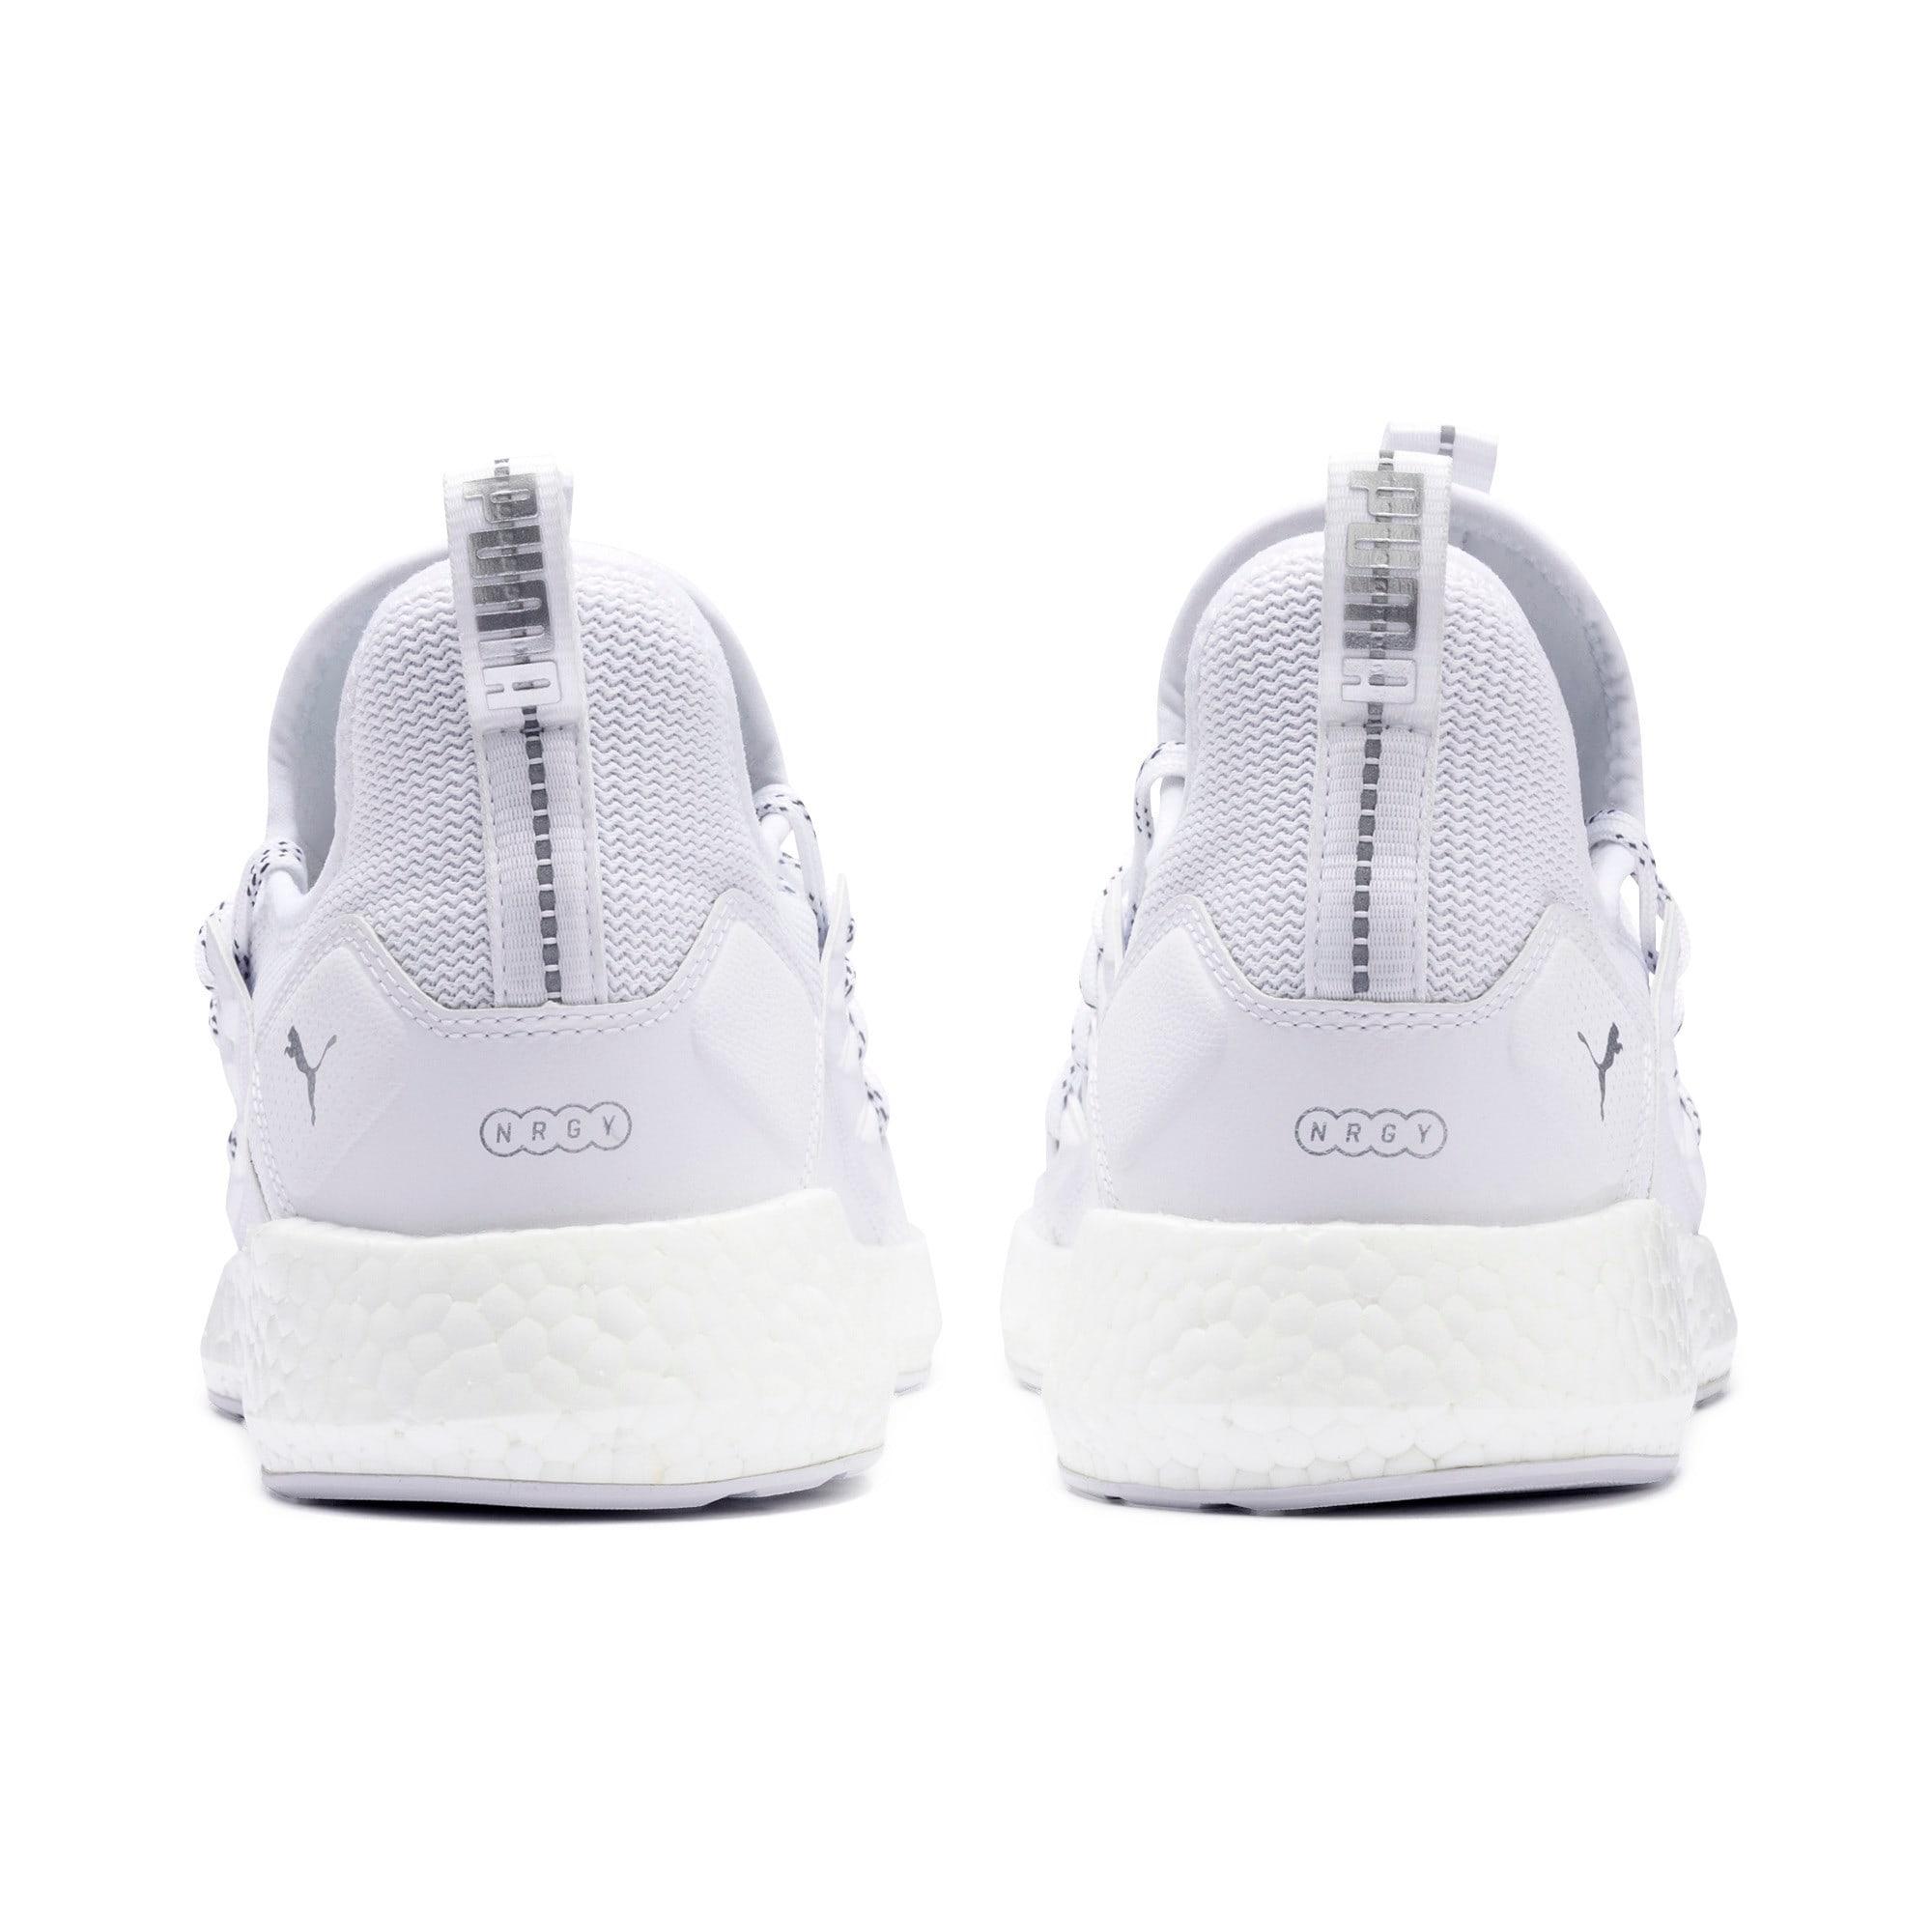 Thumbnail 4 of NRGY Neko Lights Men's Running Shoes, Puma White, medium